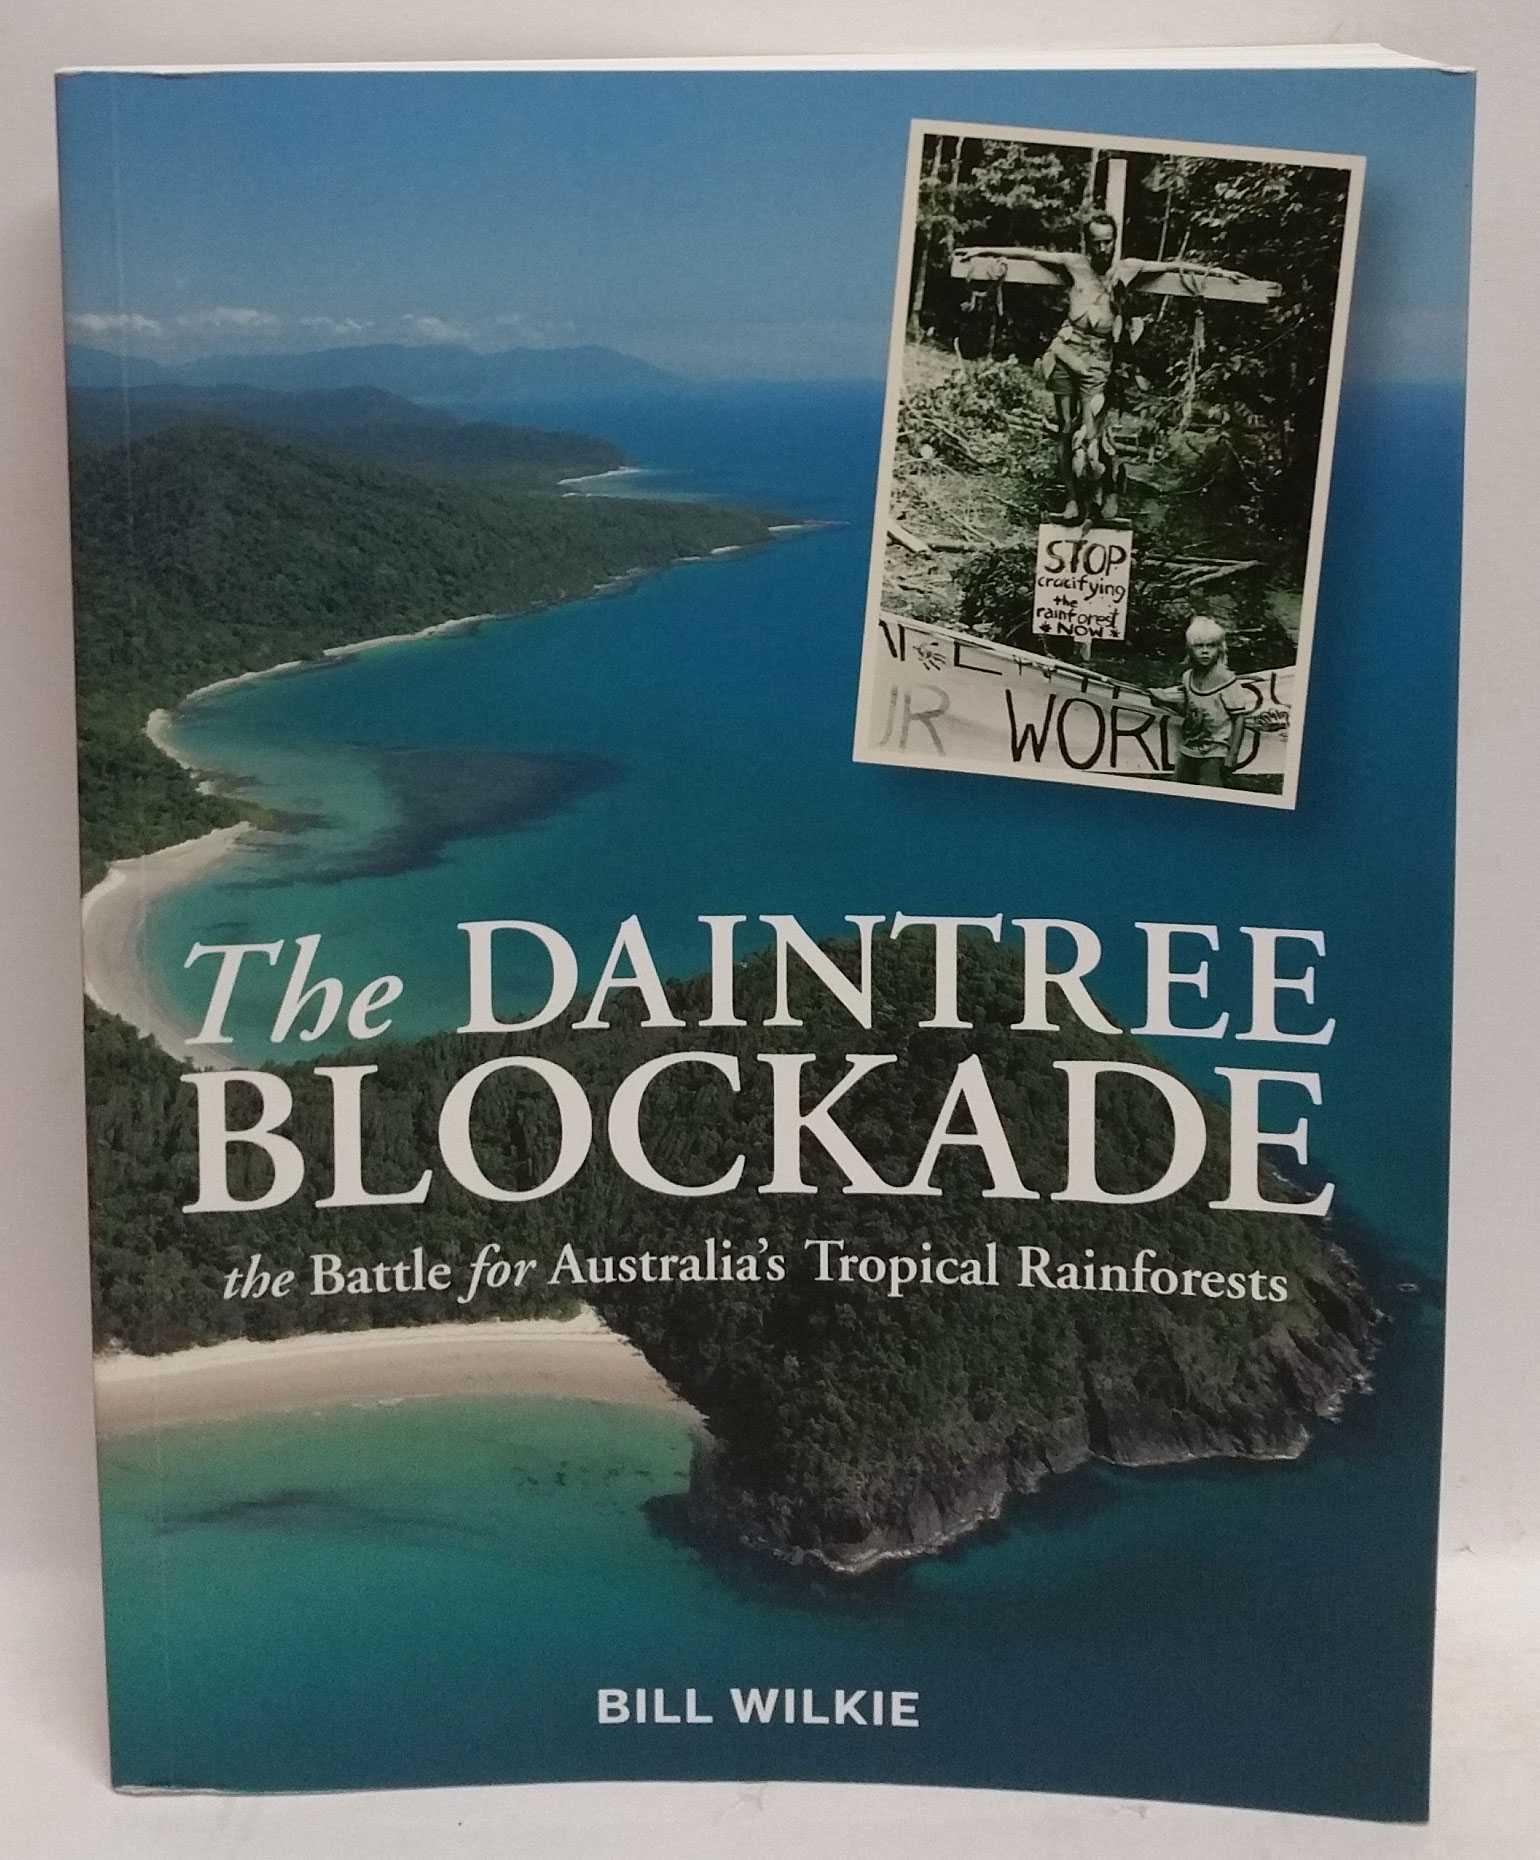 BILL WILKIE - The Daintree Blockade: The Battle for Australia's Tropical Rainforests